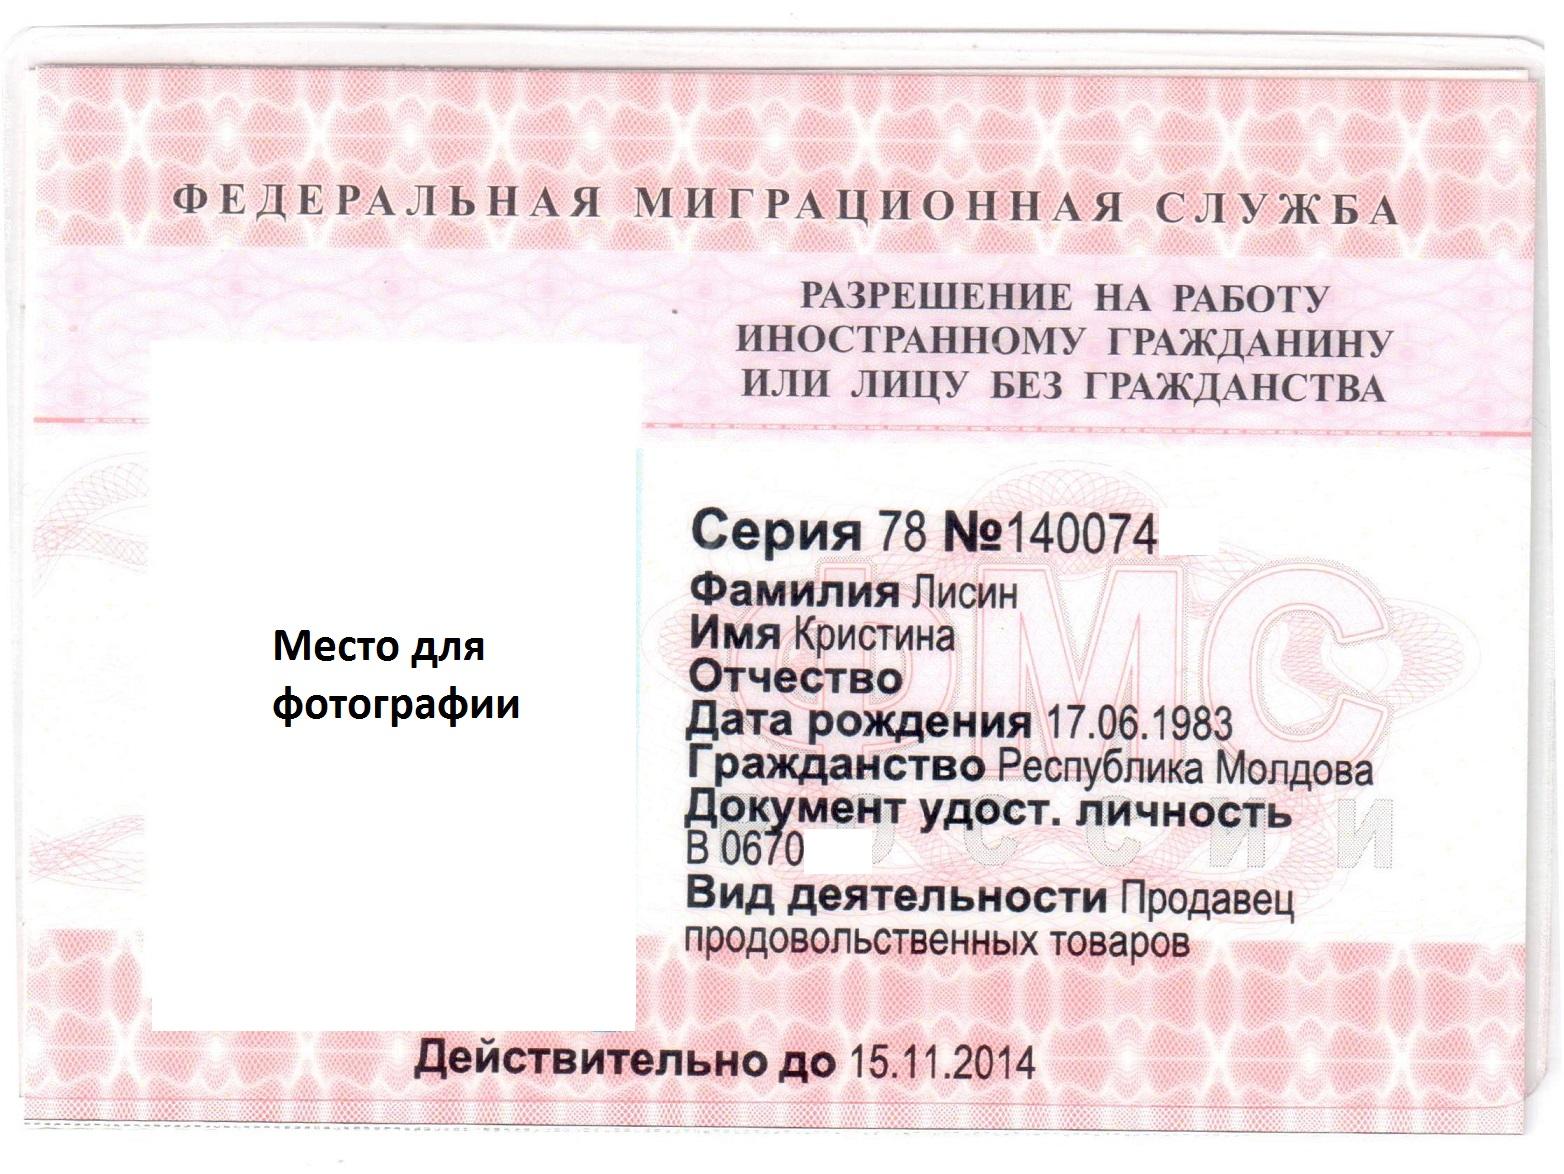 Патент на работу для граждан Украины в 2018 г 47